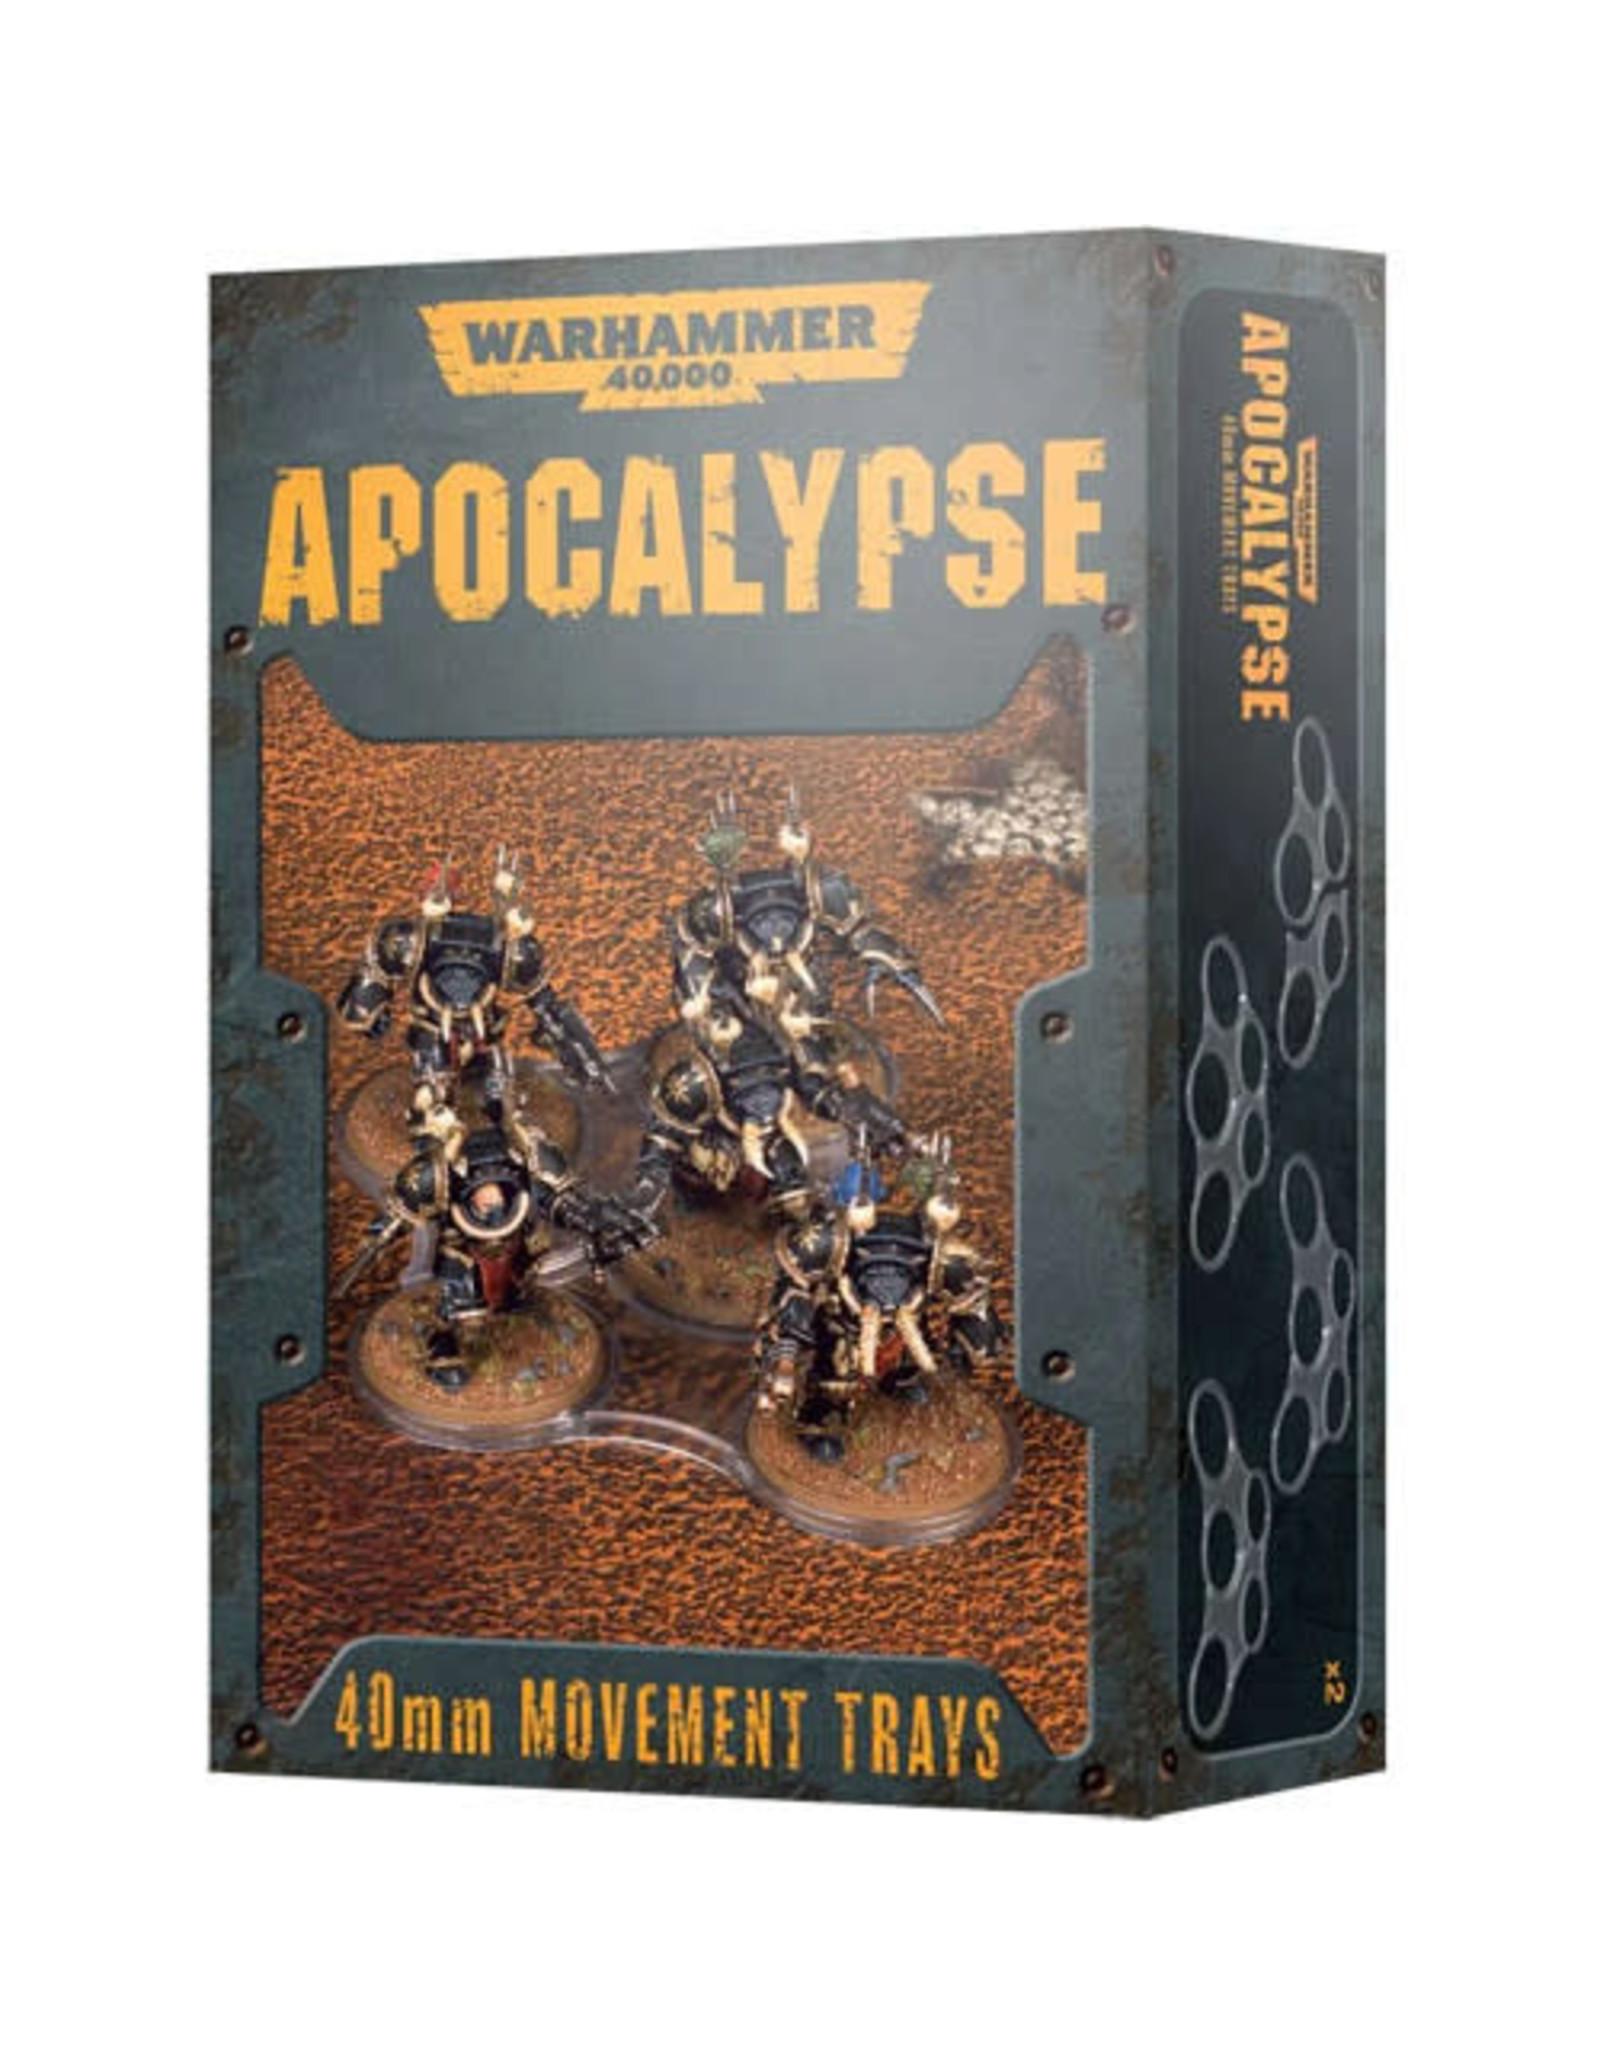 Apocalypse Movement Trays 40mm (40K)